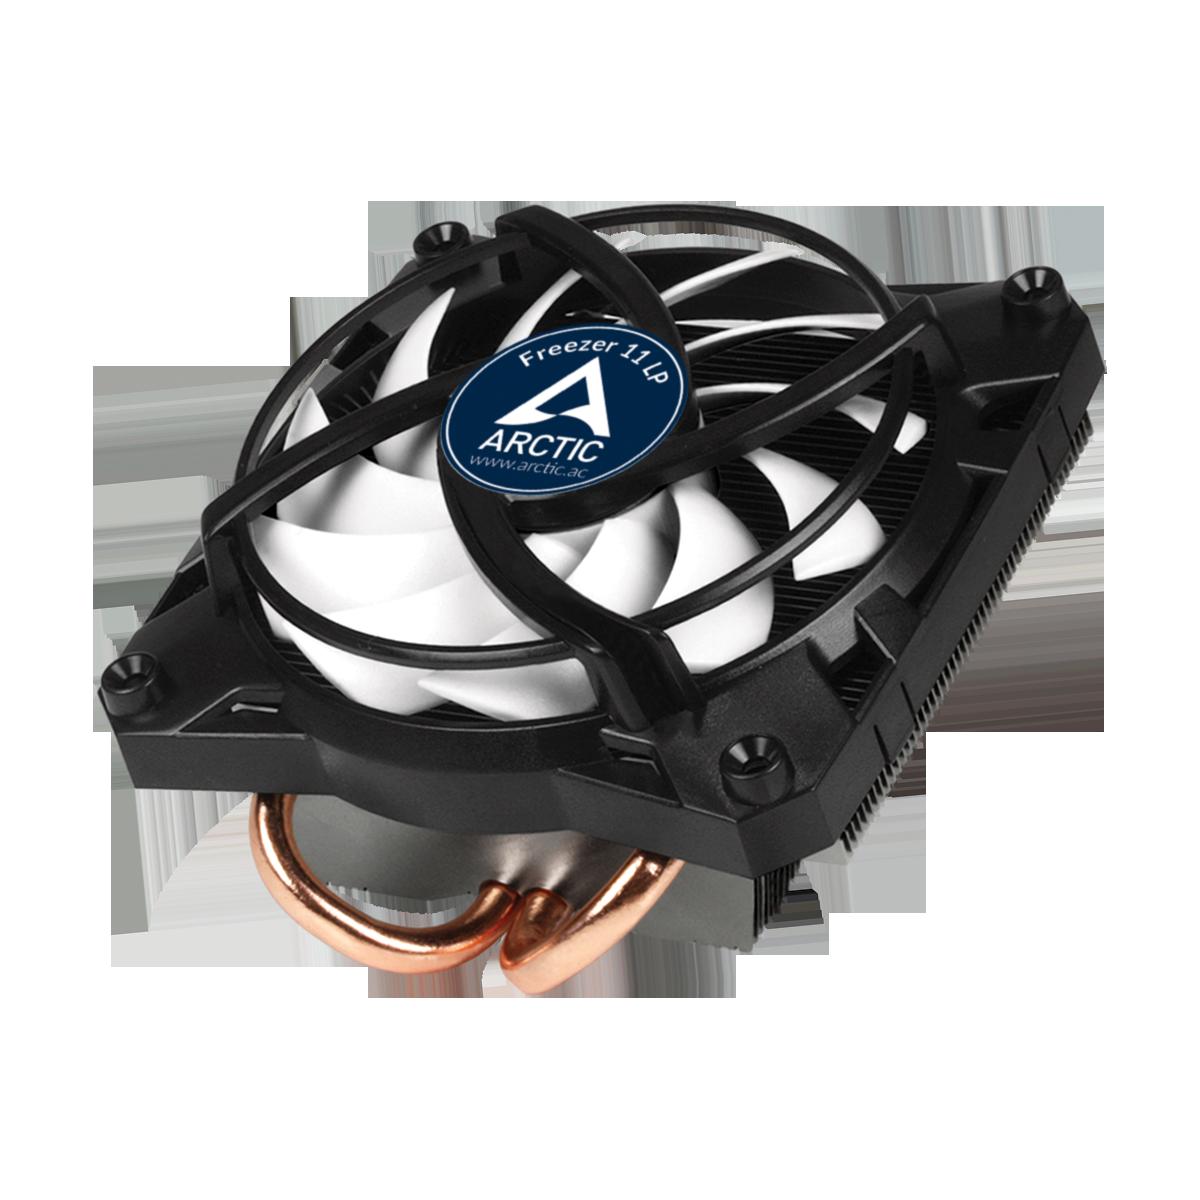 Low Profile CPU Cooler for Intel CPU ARCTIC Freezer 11 LP